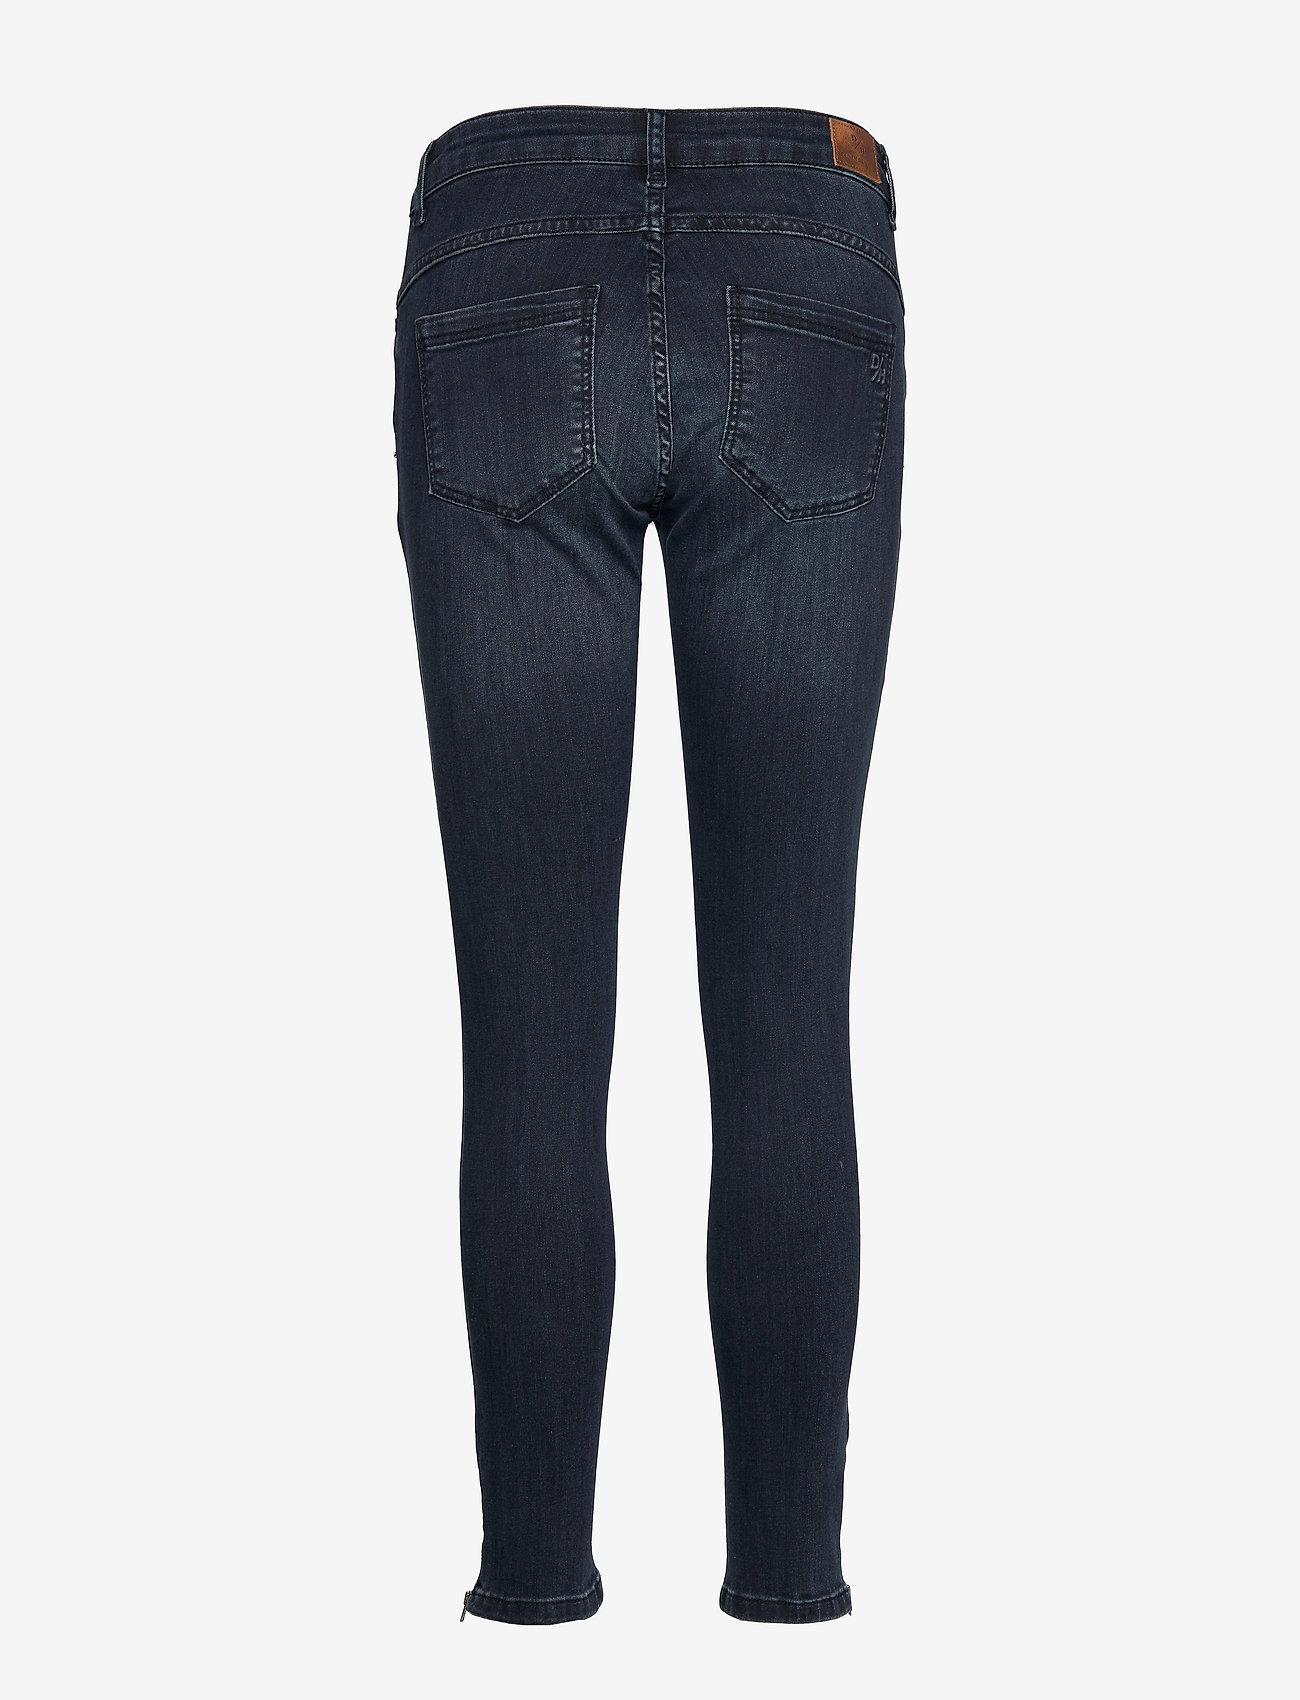 Denim Hunter - 31 THE CELINAZIP CUSTOM - slim jeans - dark blue wash - 1